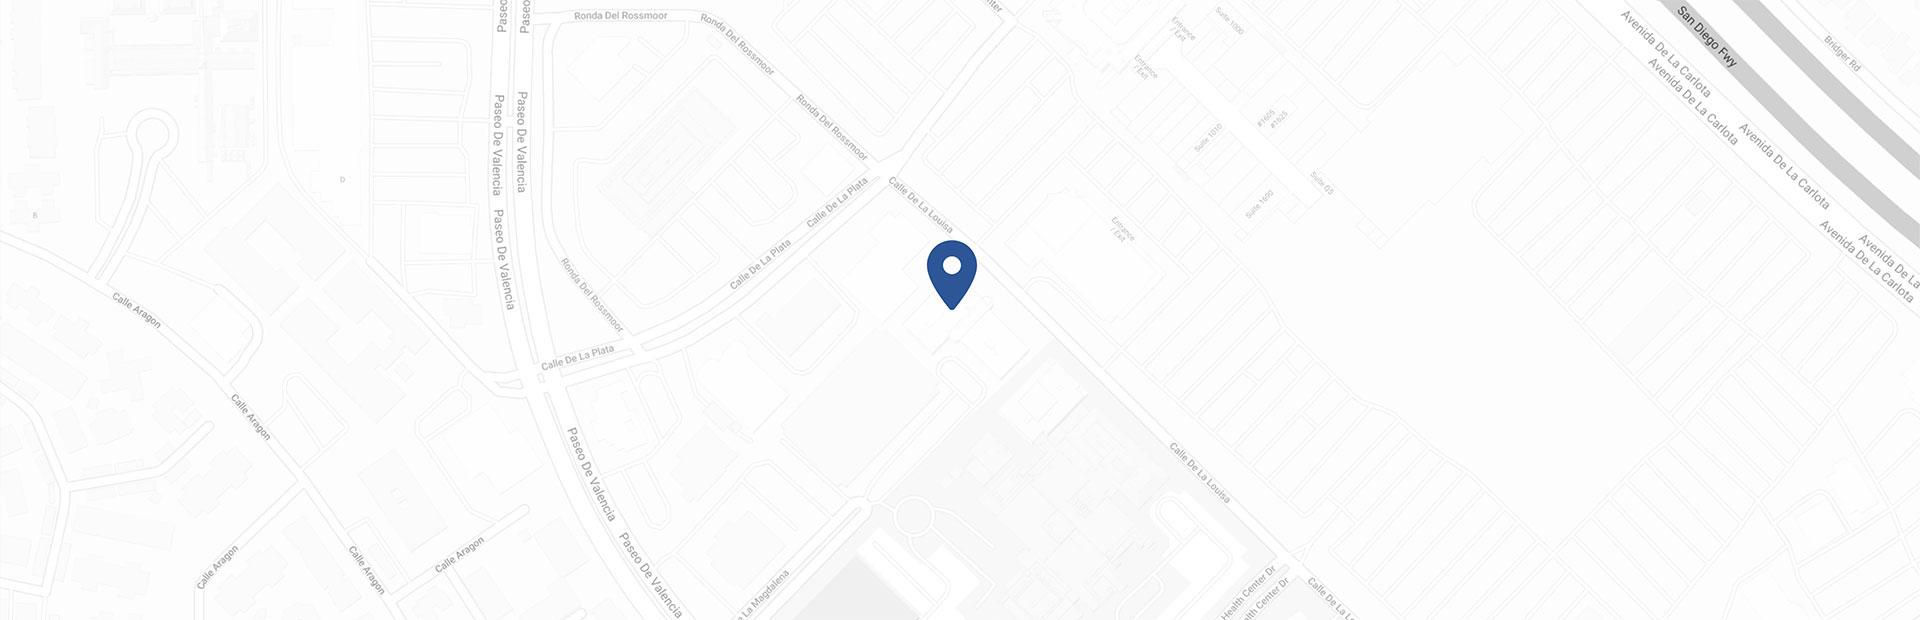 map-laguna-hills-location